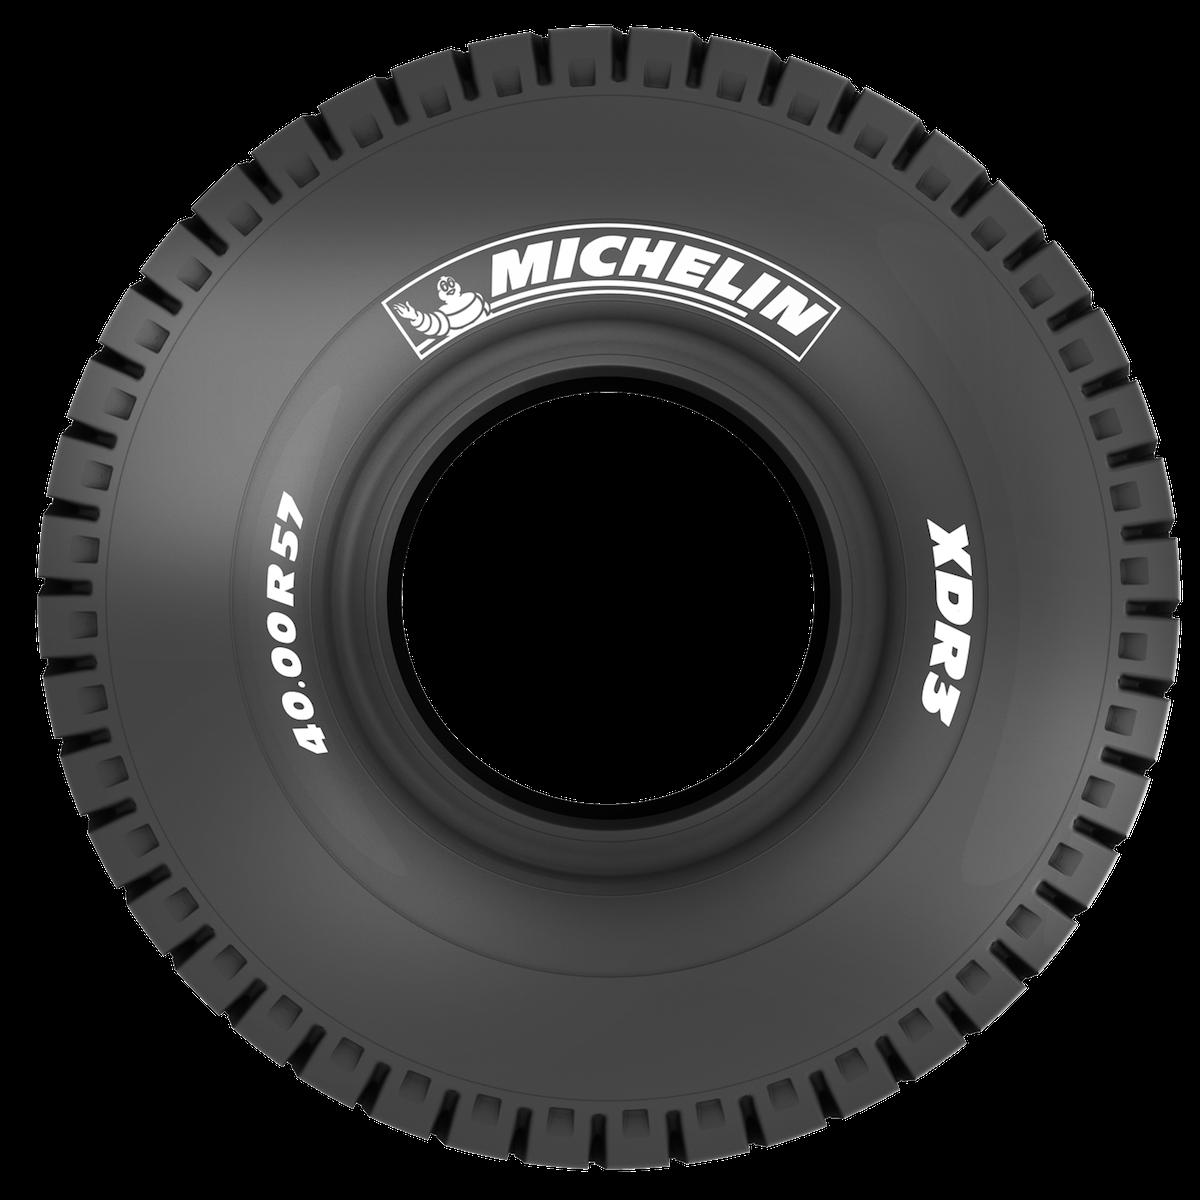 إطار ميشلان الجديد اكس دي ار 3 (XDR3)